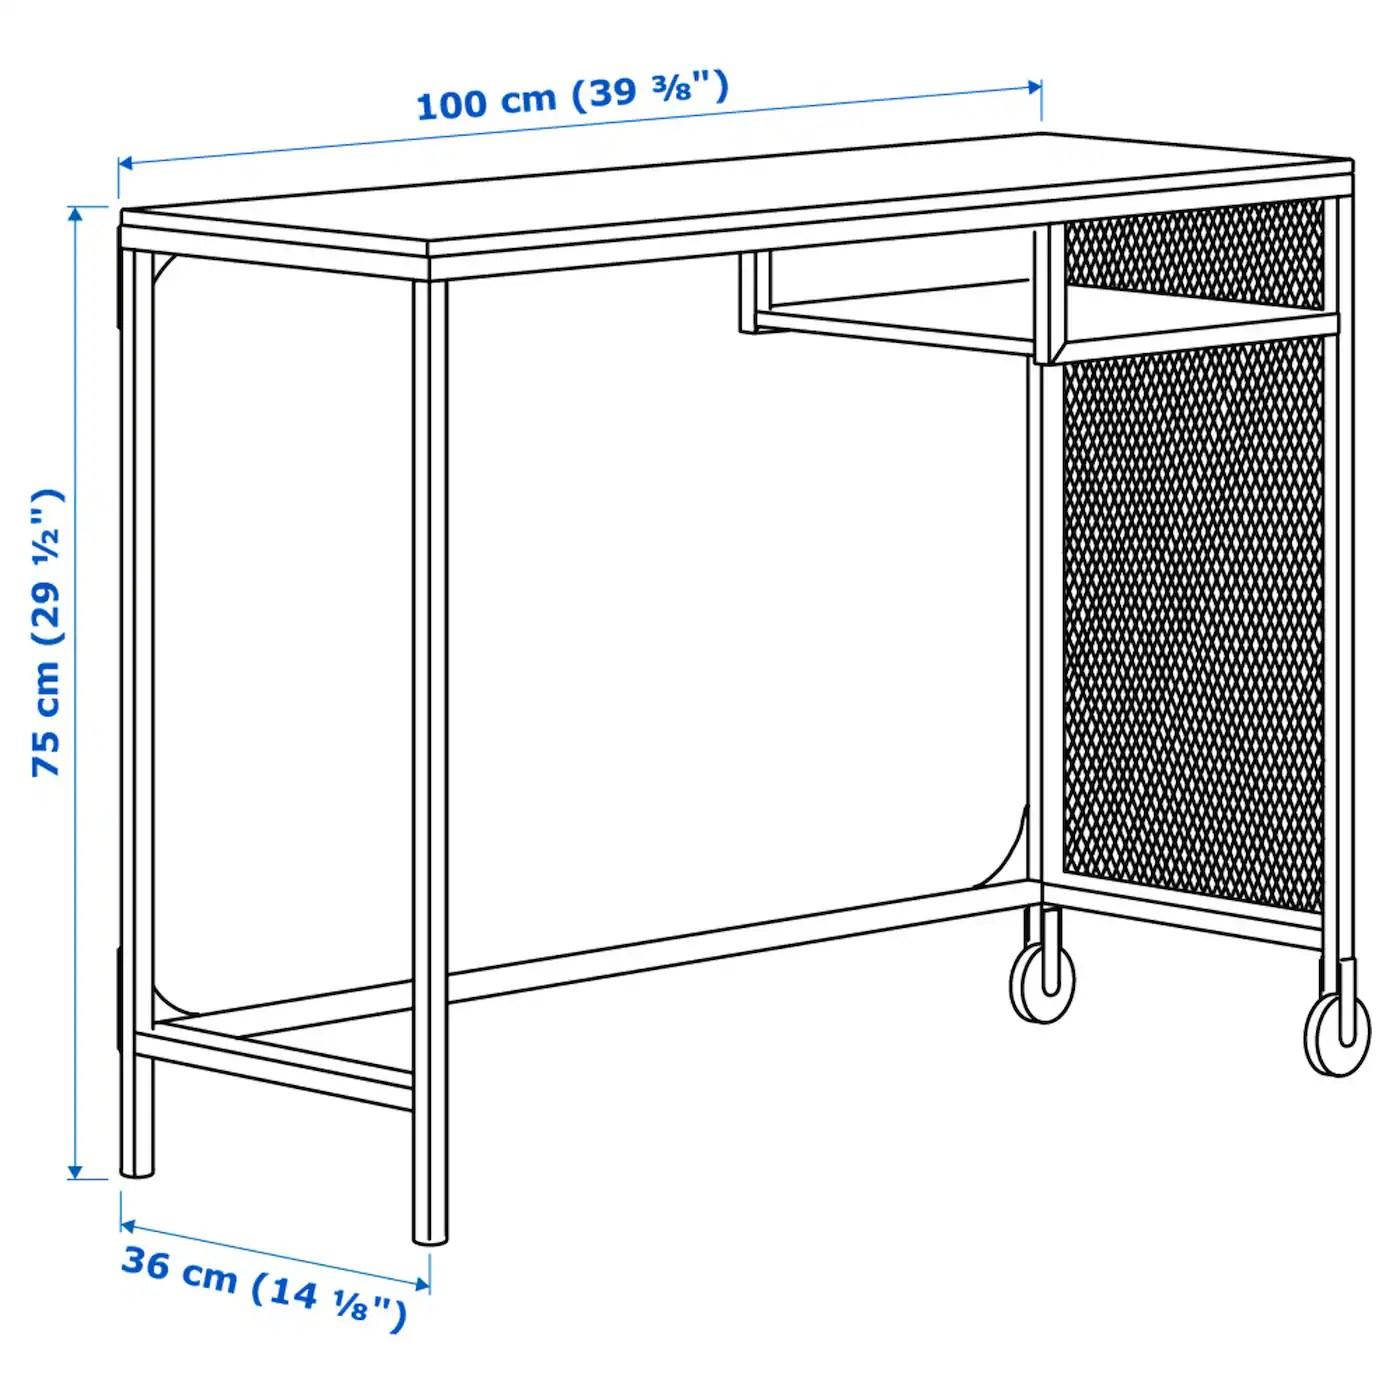 Fjallbo Table Ordinateur Portable Noir 100x36 Cm Ikea